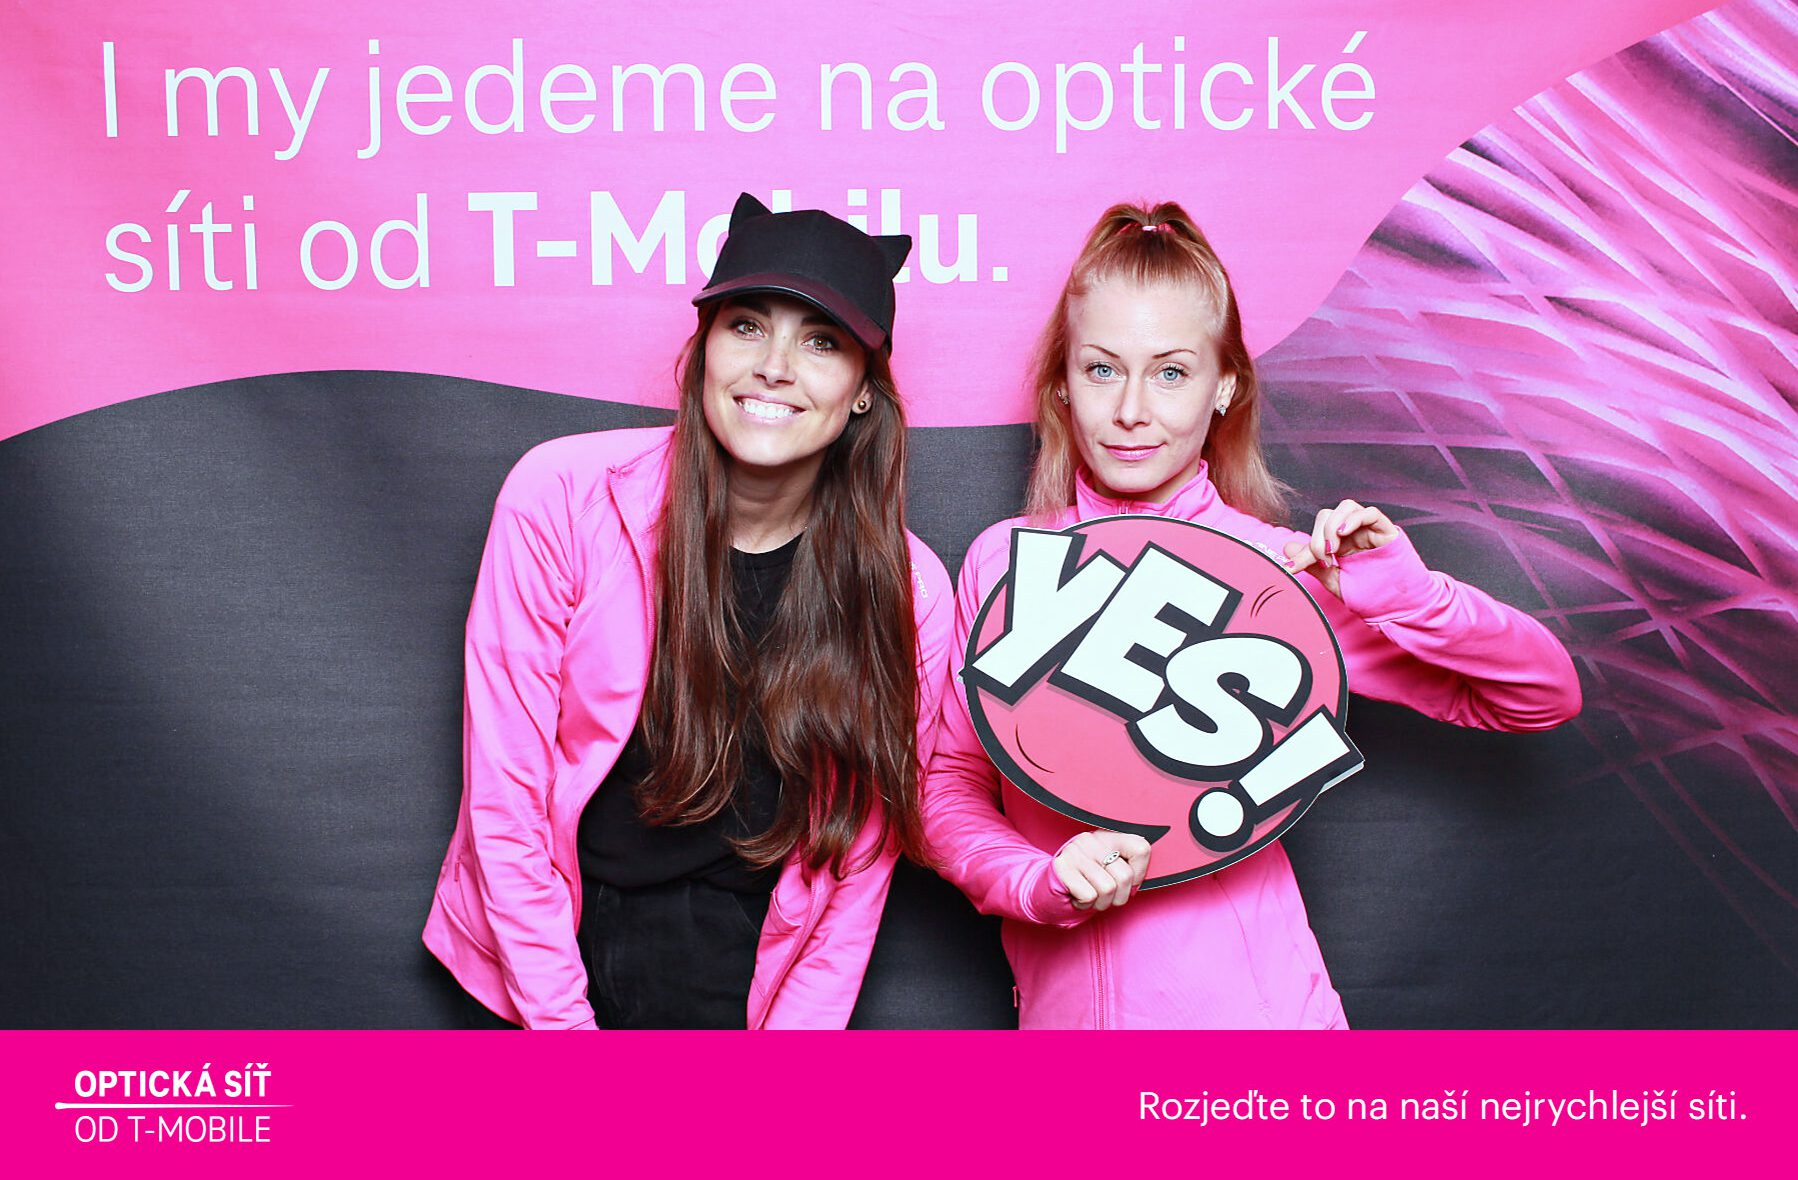 fotokoutek-ceske-budejovice-promo-akce-t-mobile-29-9-2021-755484